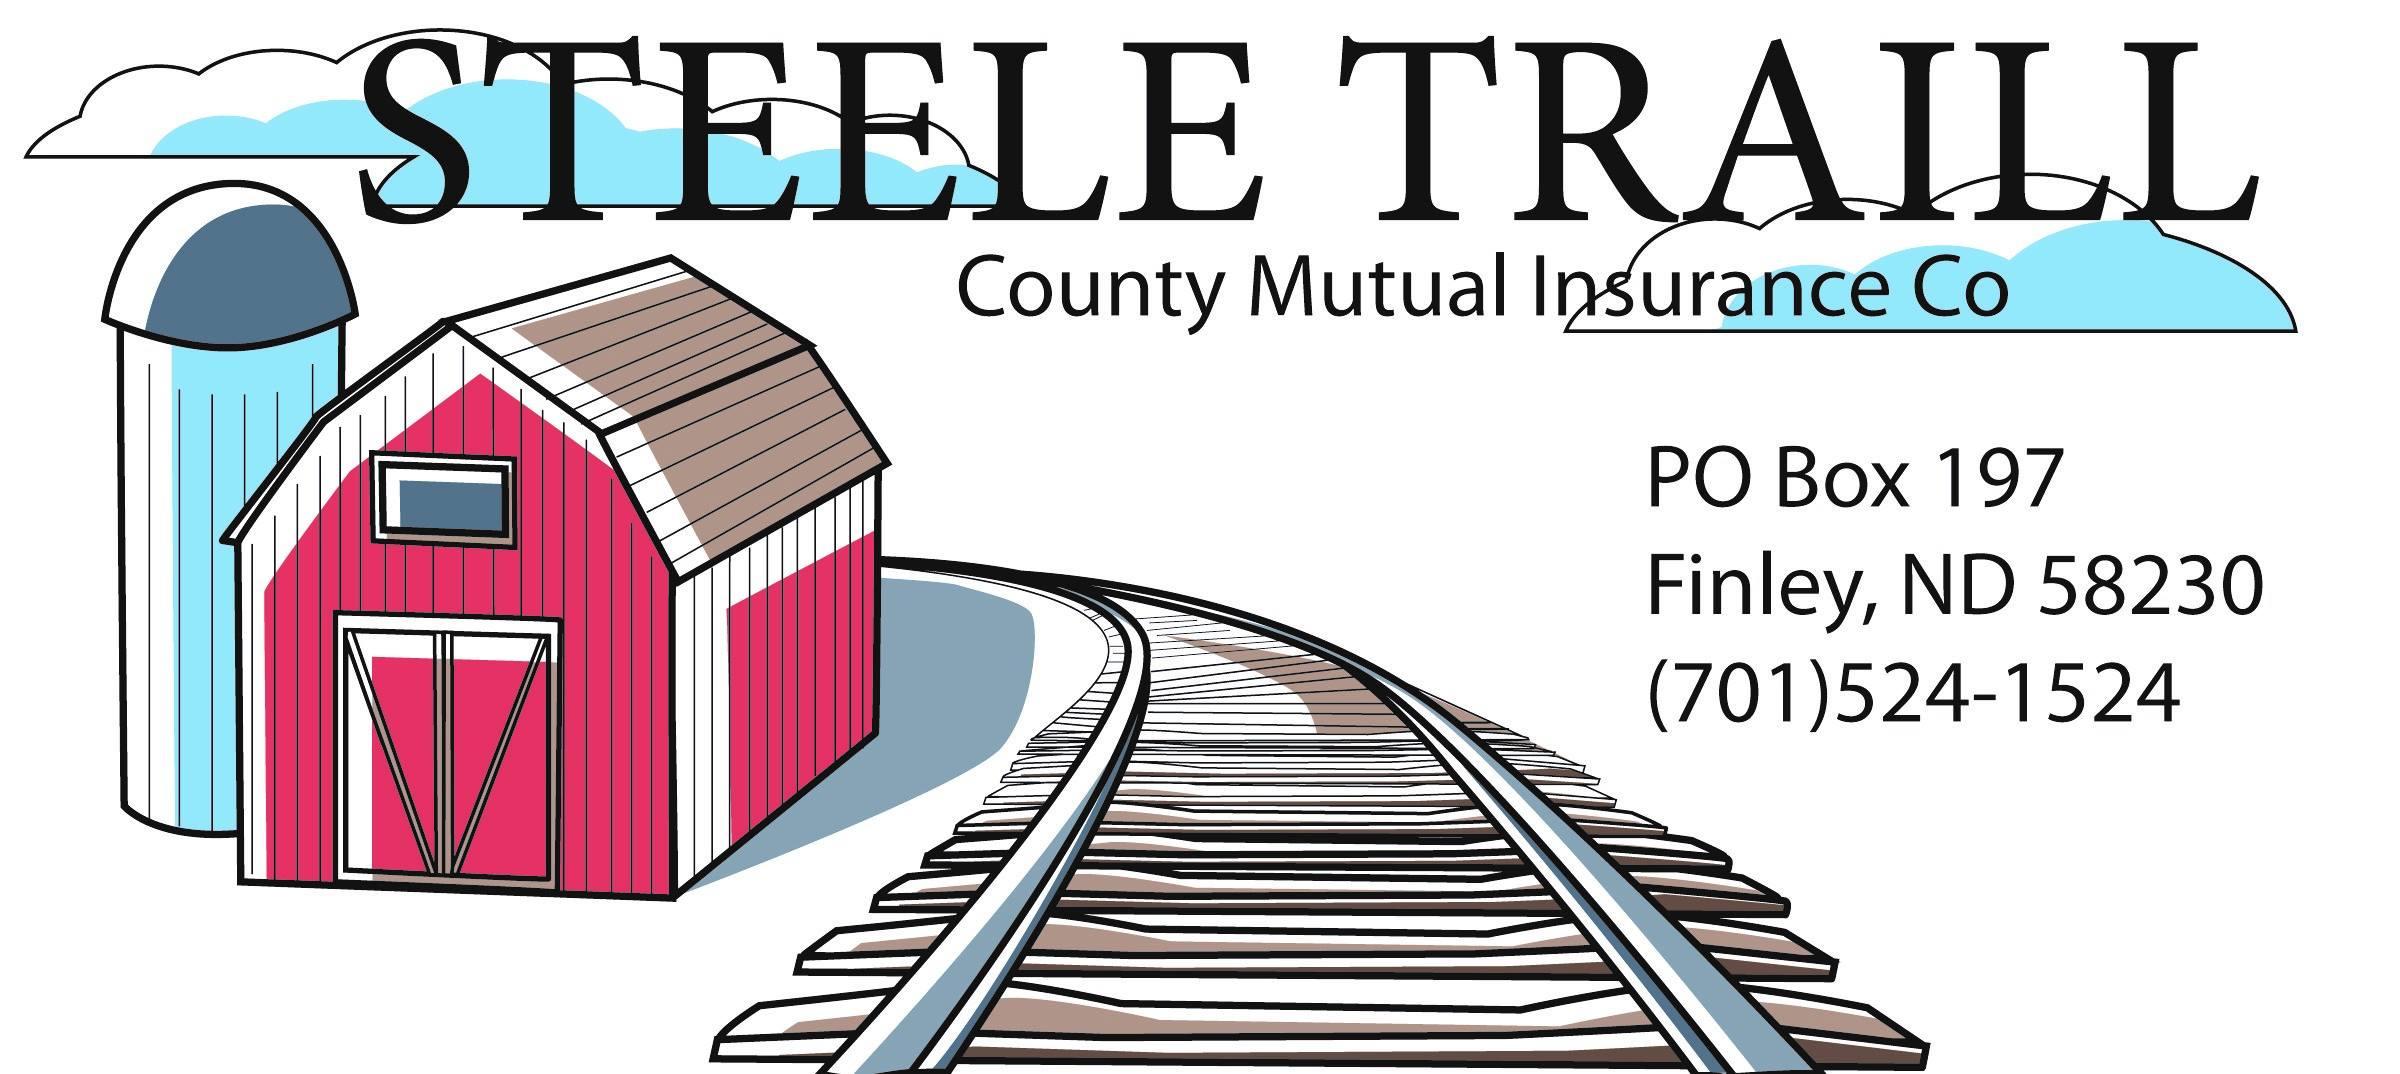 Steele Traill County Mutual Insurance Company